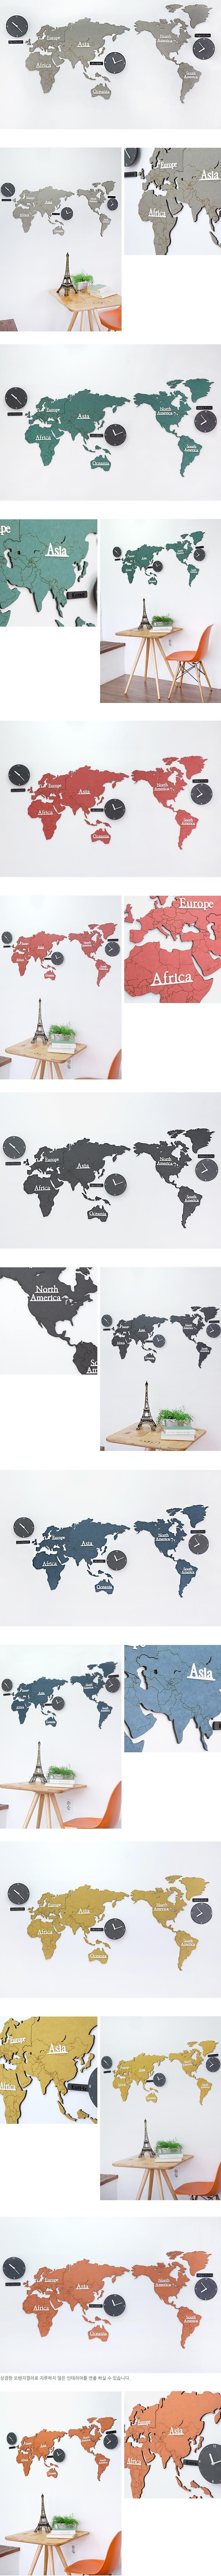 World in Colors DIY Wall map 3 Time Zones Clocks карта мира wereldkaart peta Dunia léarscáil an domhain Harta e botes världskarta خريطة العالم  maailmankartta ramani ya dunia orbis